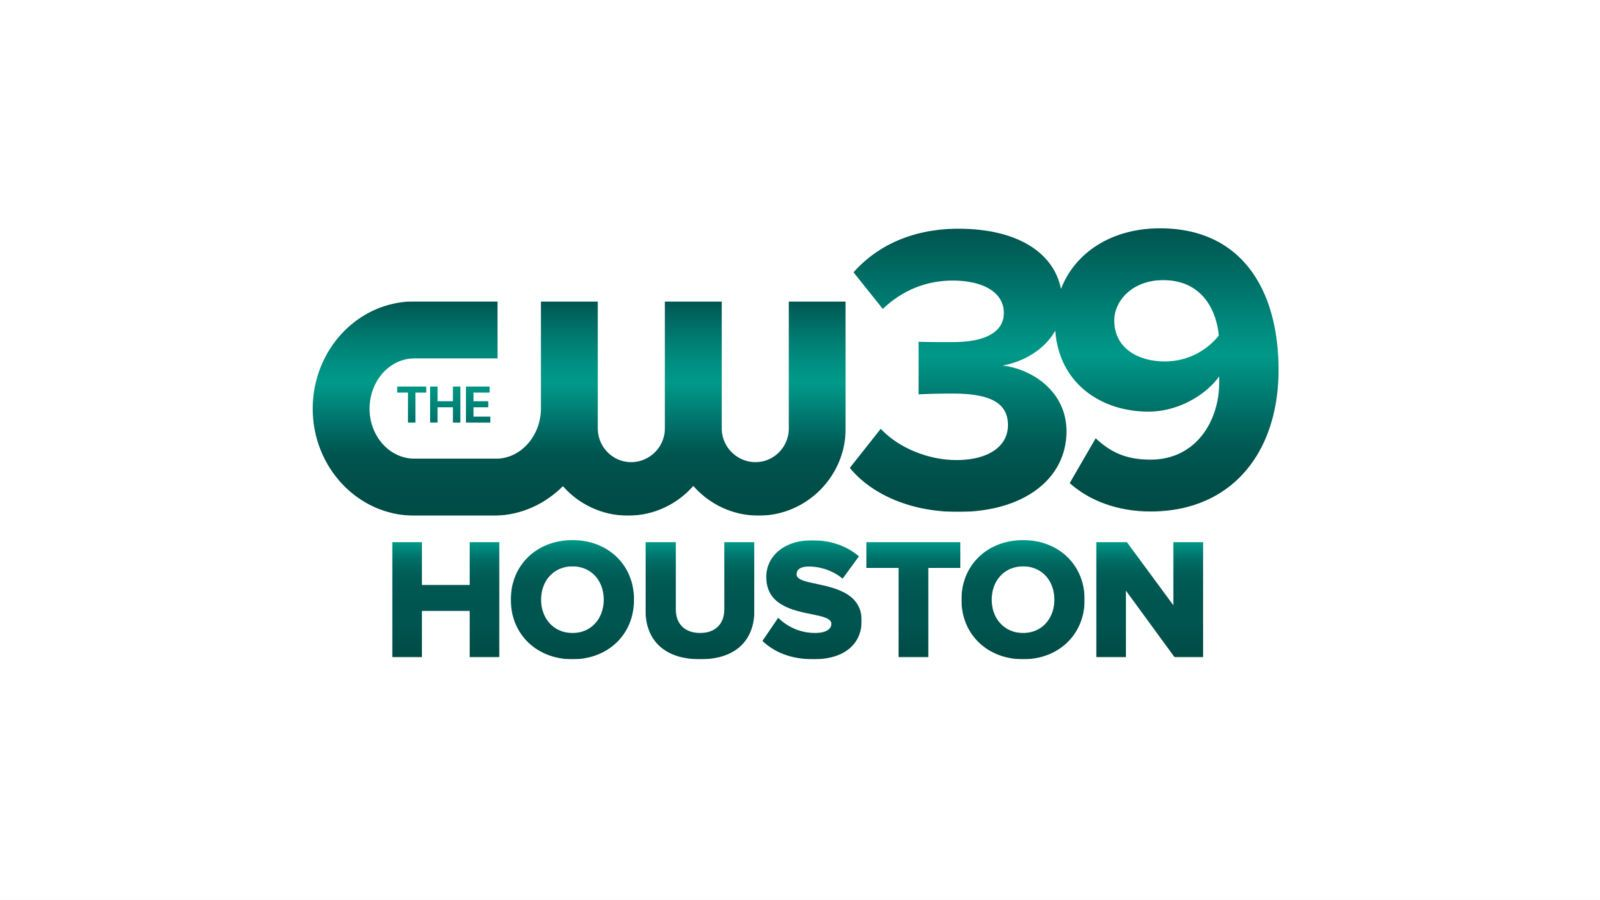 https://jbdondolo.org/wp-content/uploads/2019/08/CW39-logo.jpg